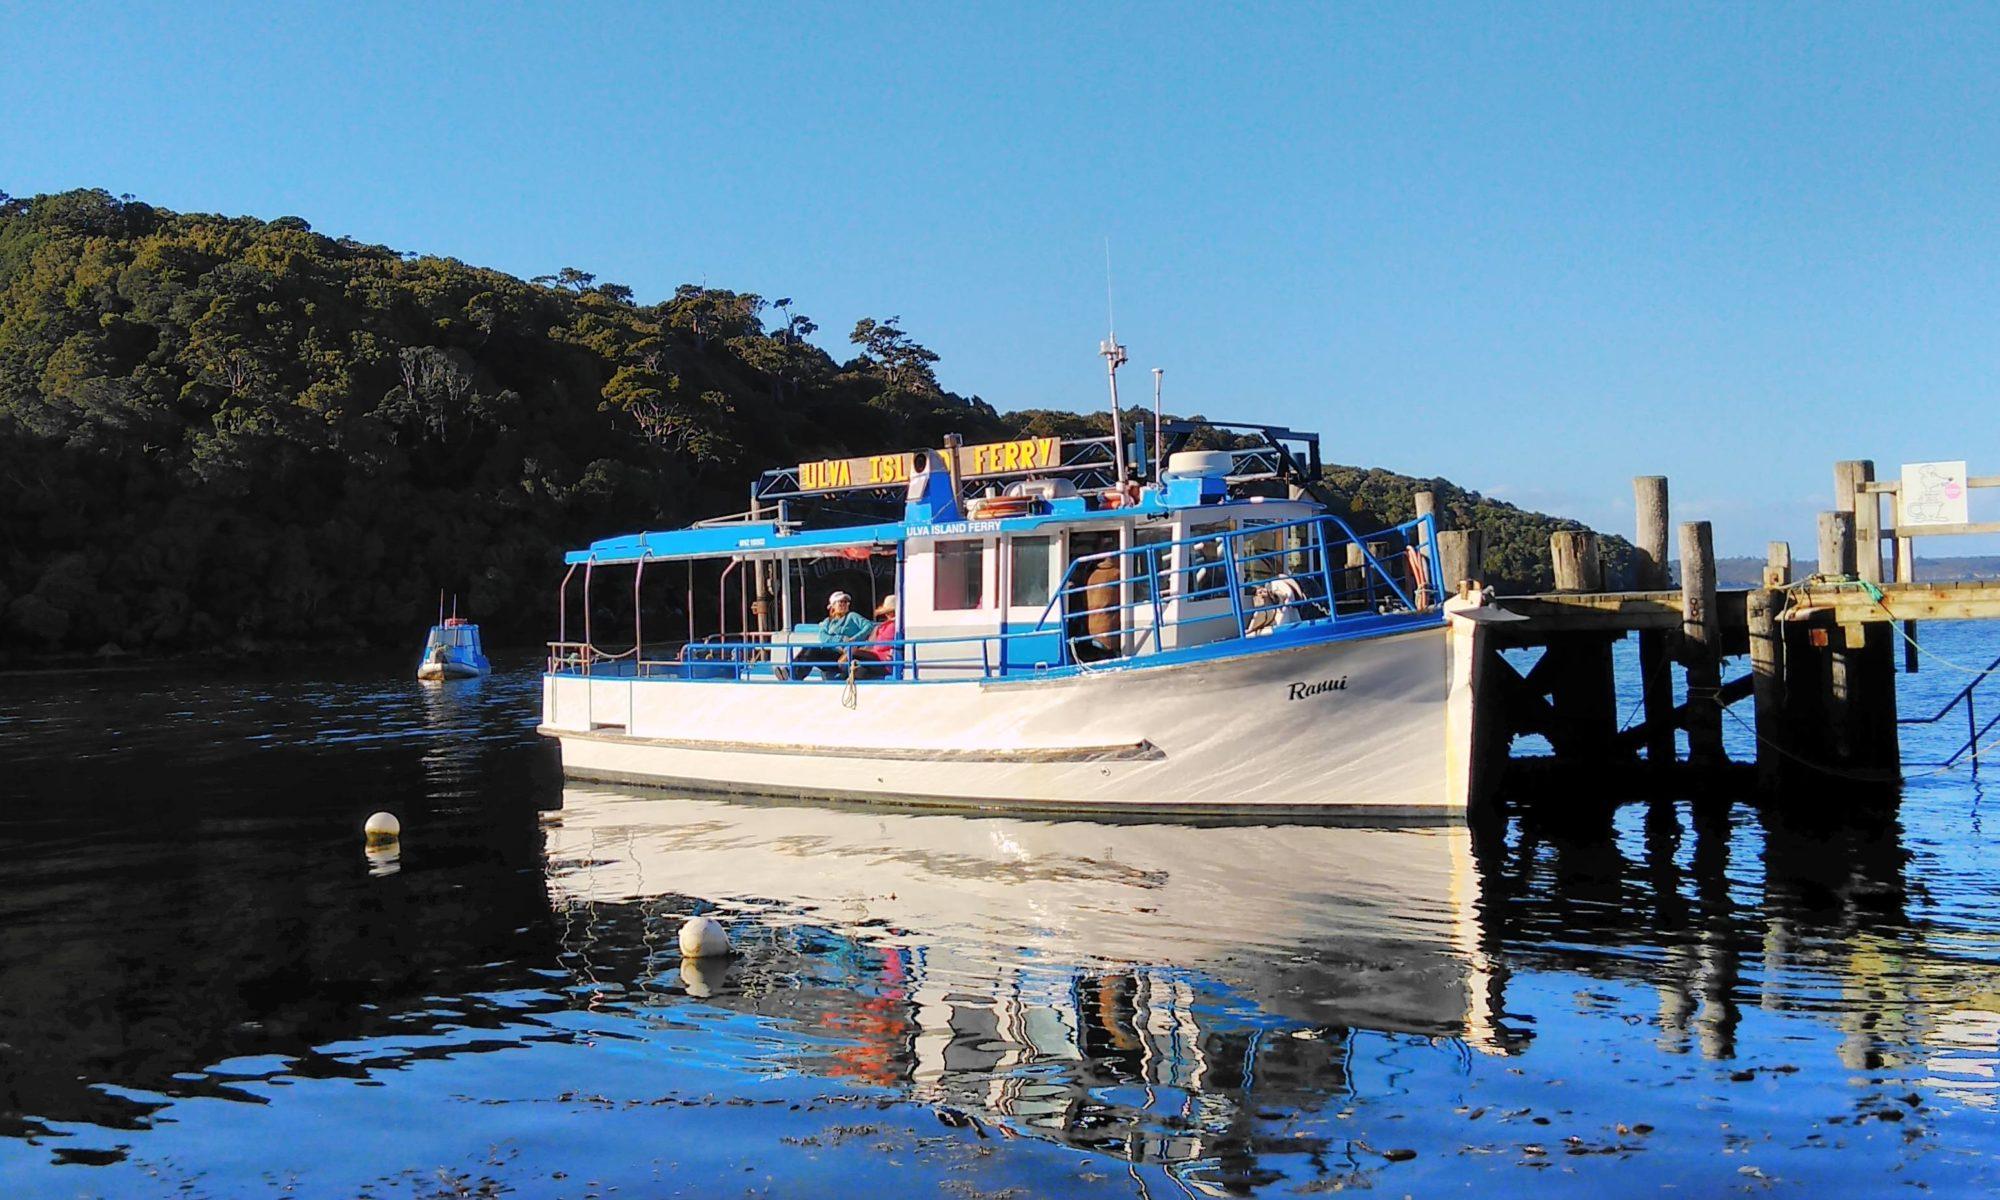 Ranui Ulva Island Ferry at Golden Bay